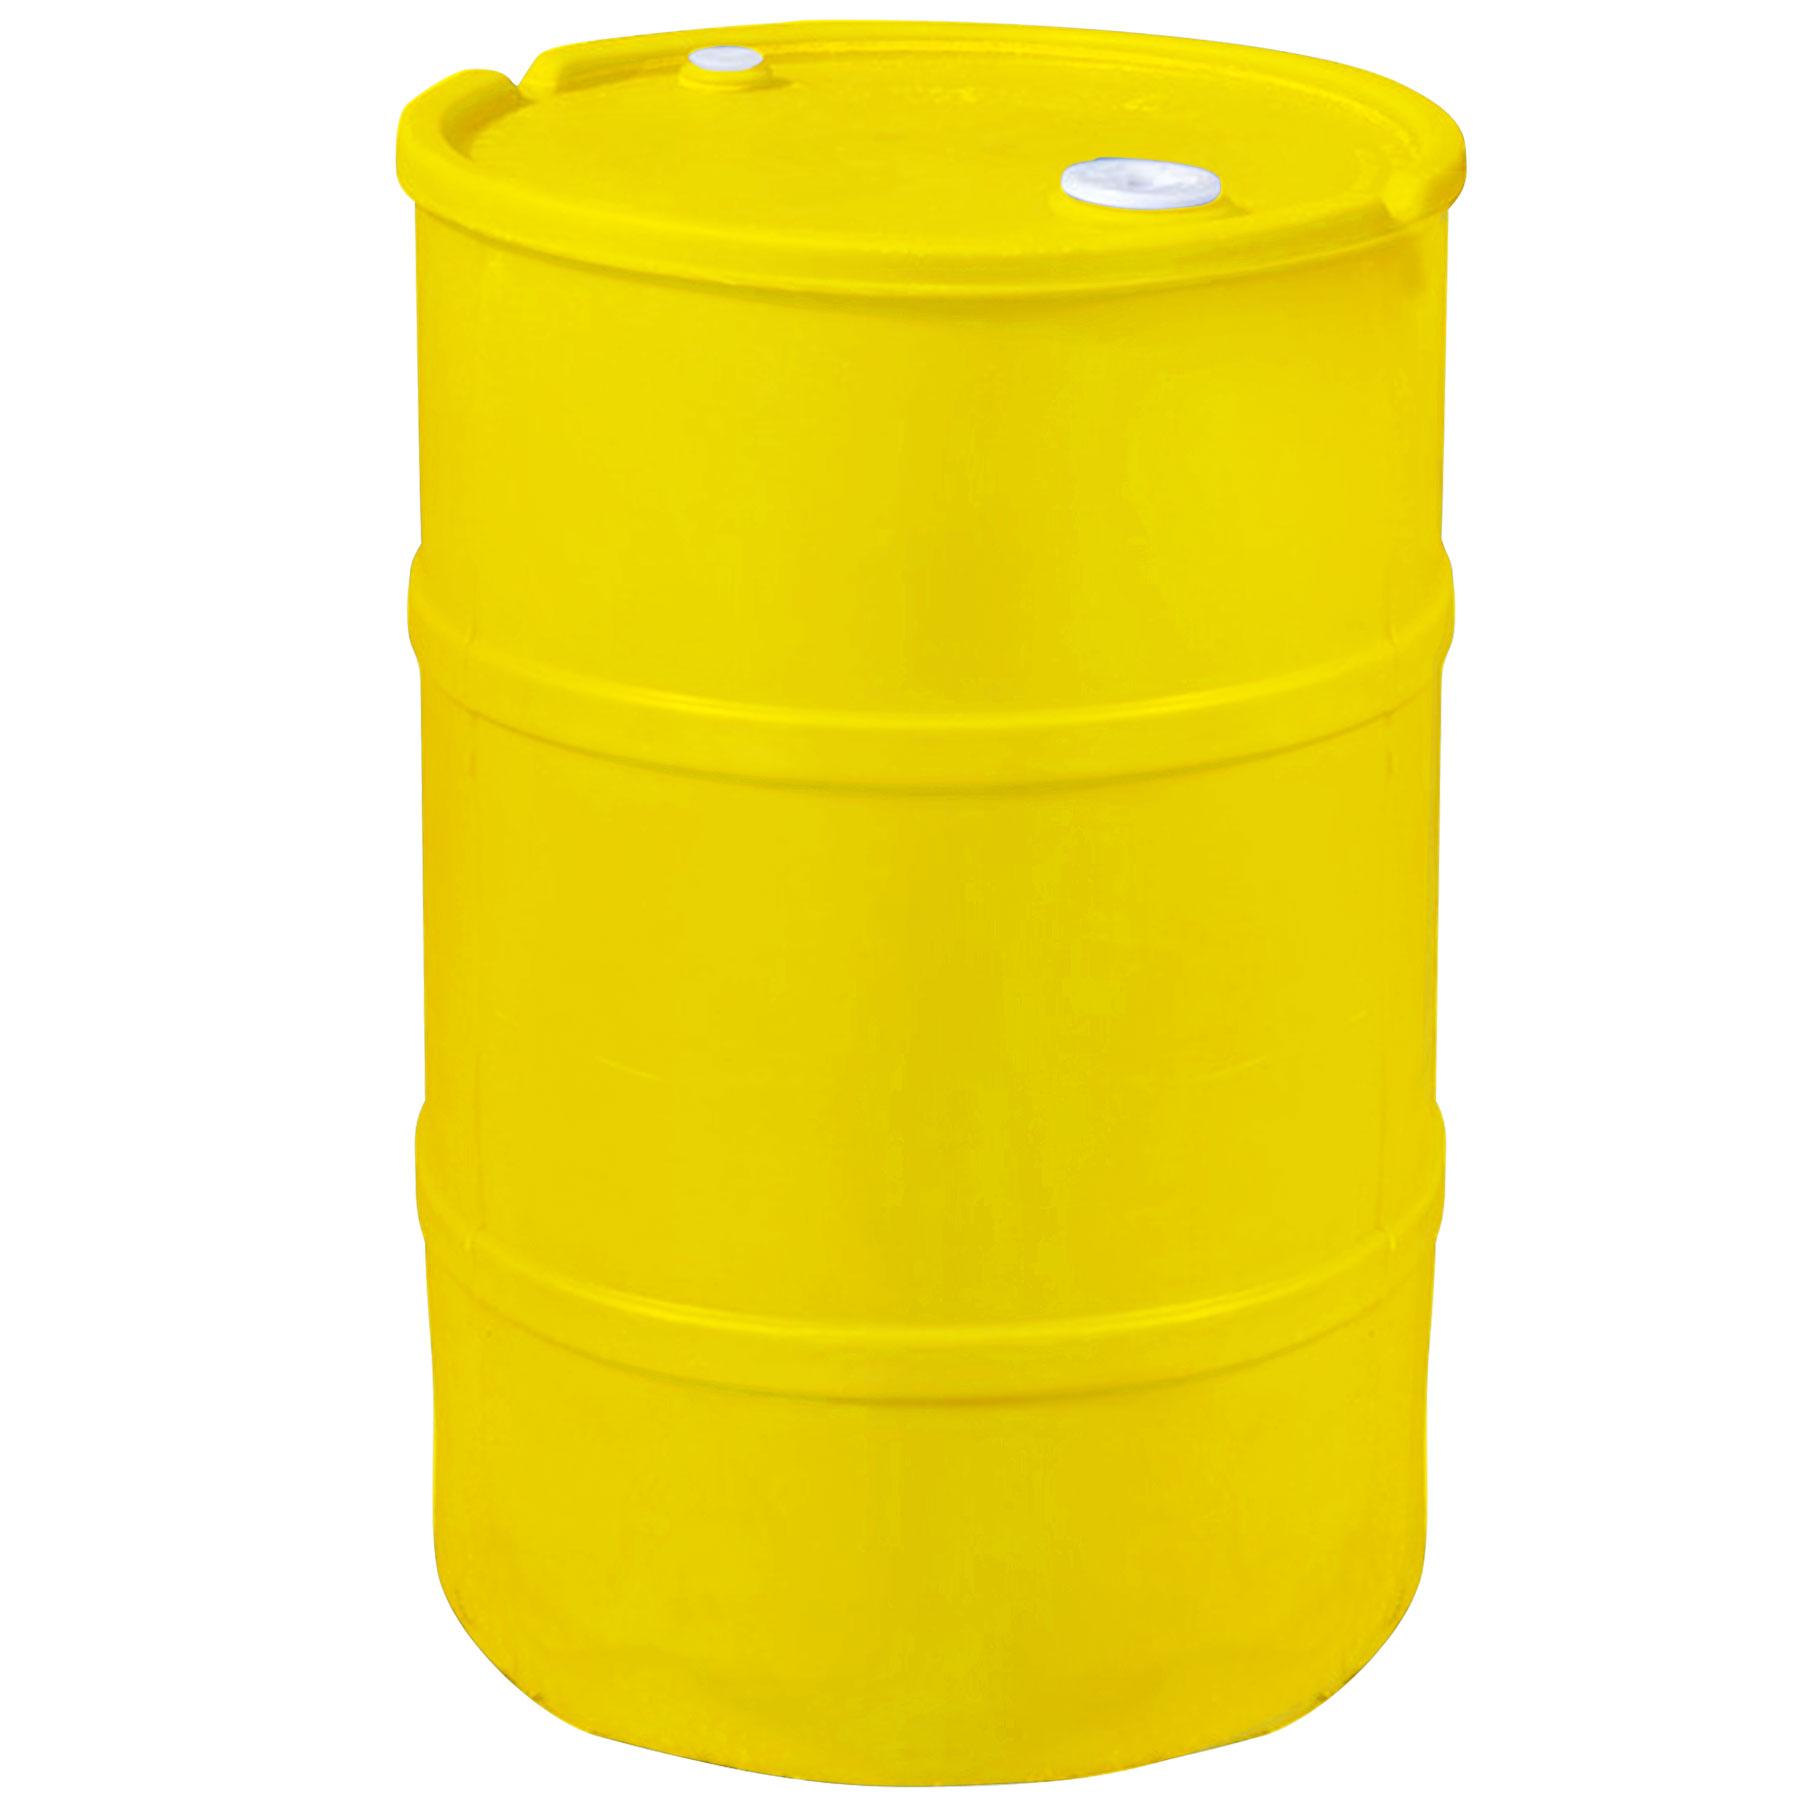 Gallon yellow plastic tight head drum the cary company